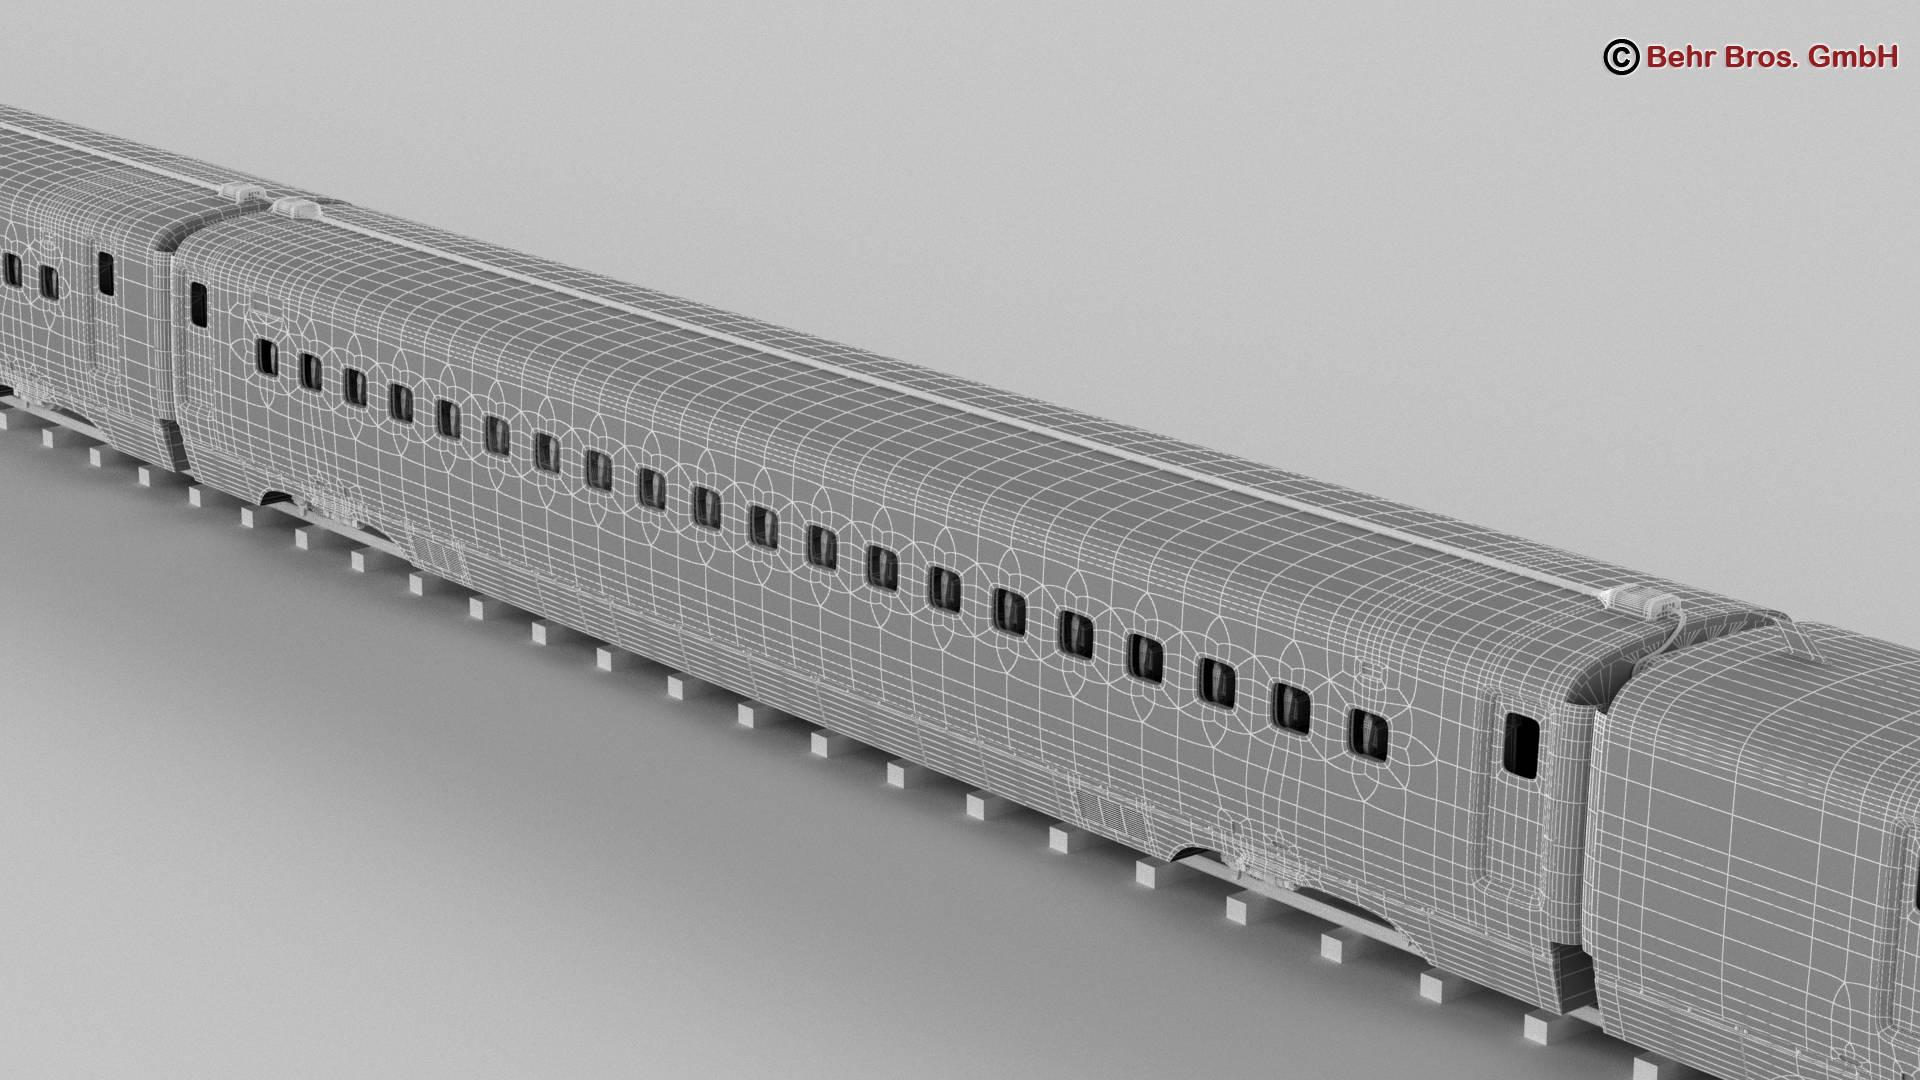 shinkansen e7 3d model 3ds max fbx c4d lwo ma mb obj 265673